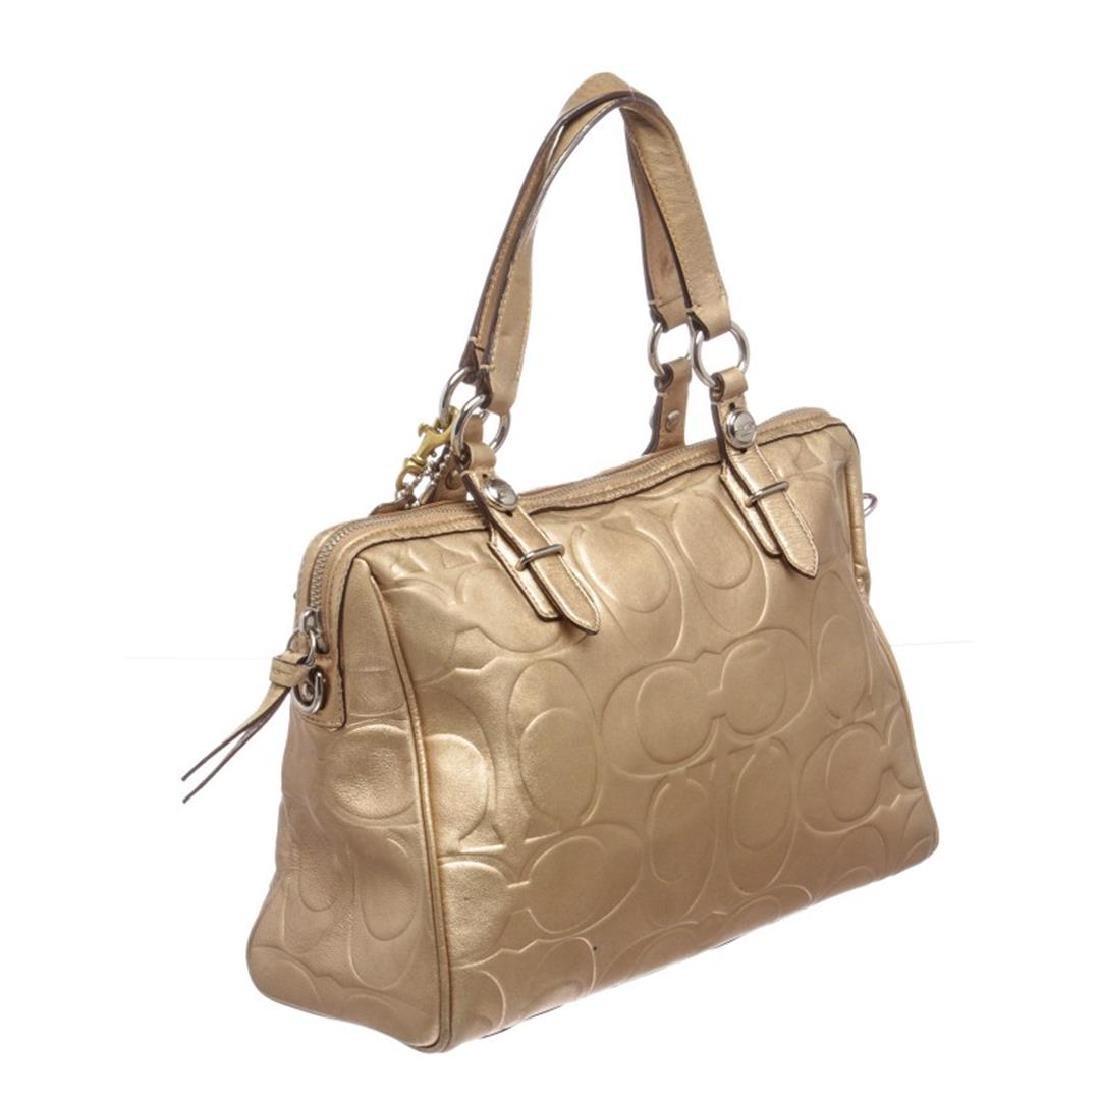 Coach Metallic Gold Monogram Leather Tote Bag - 3